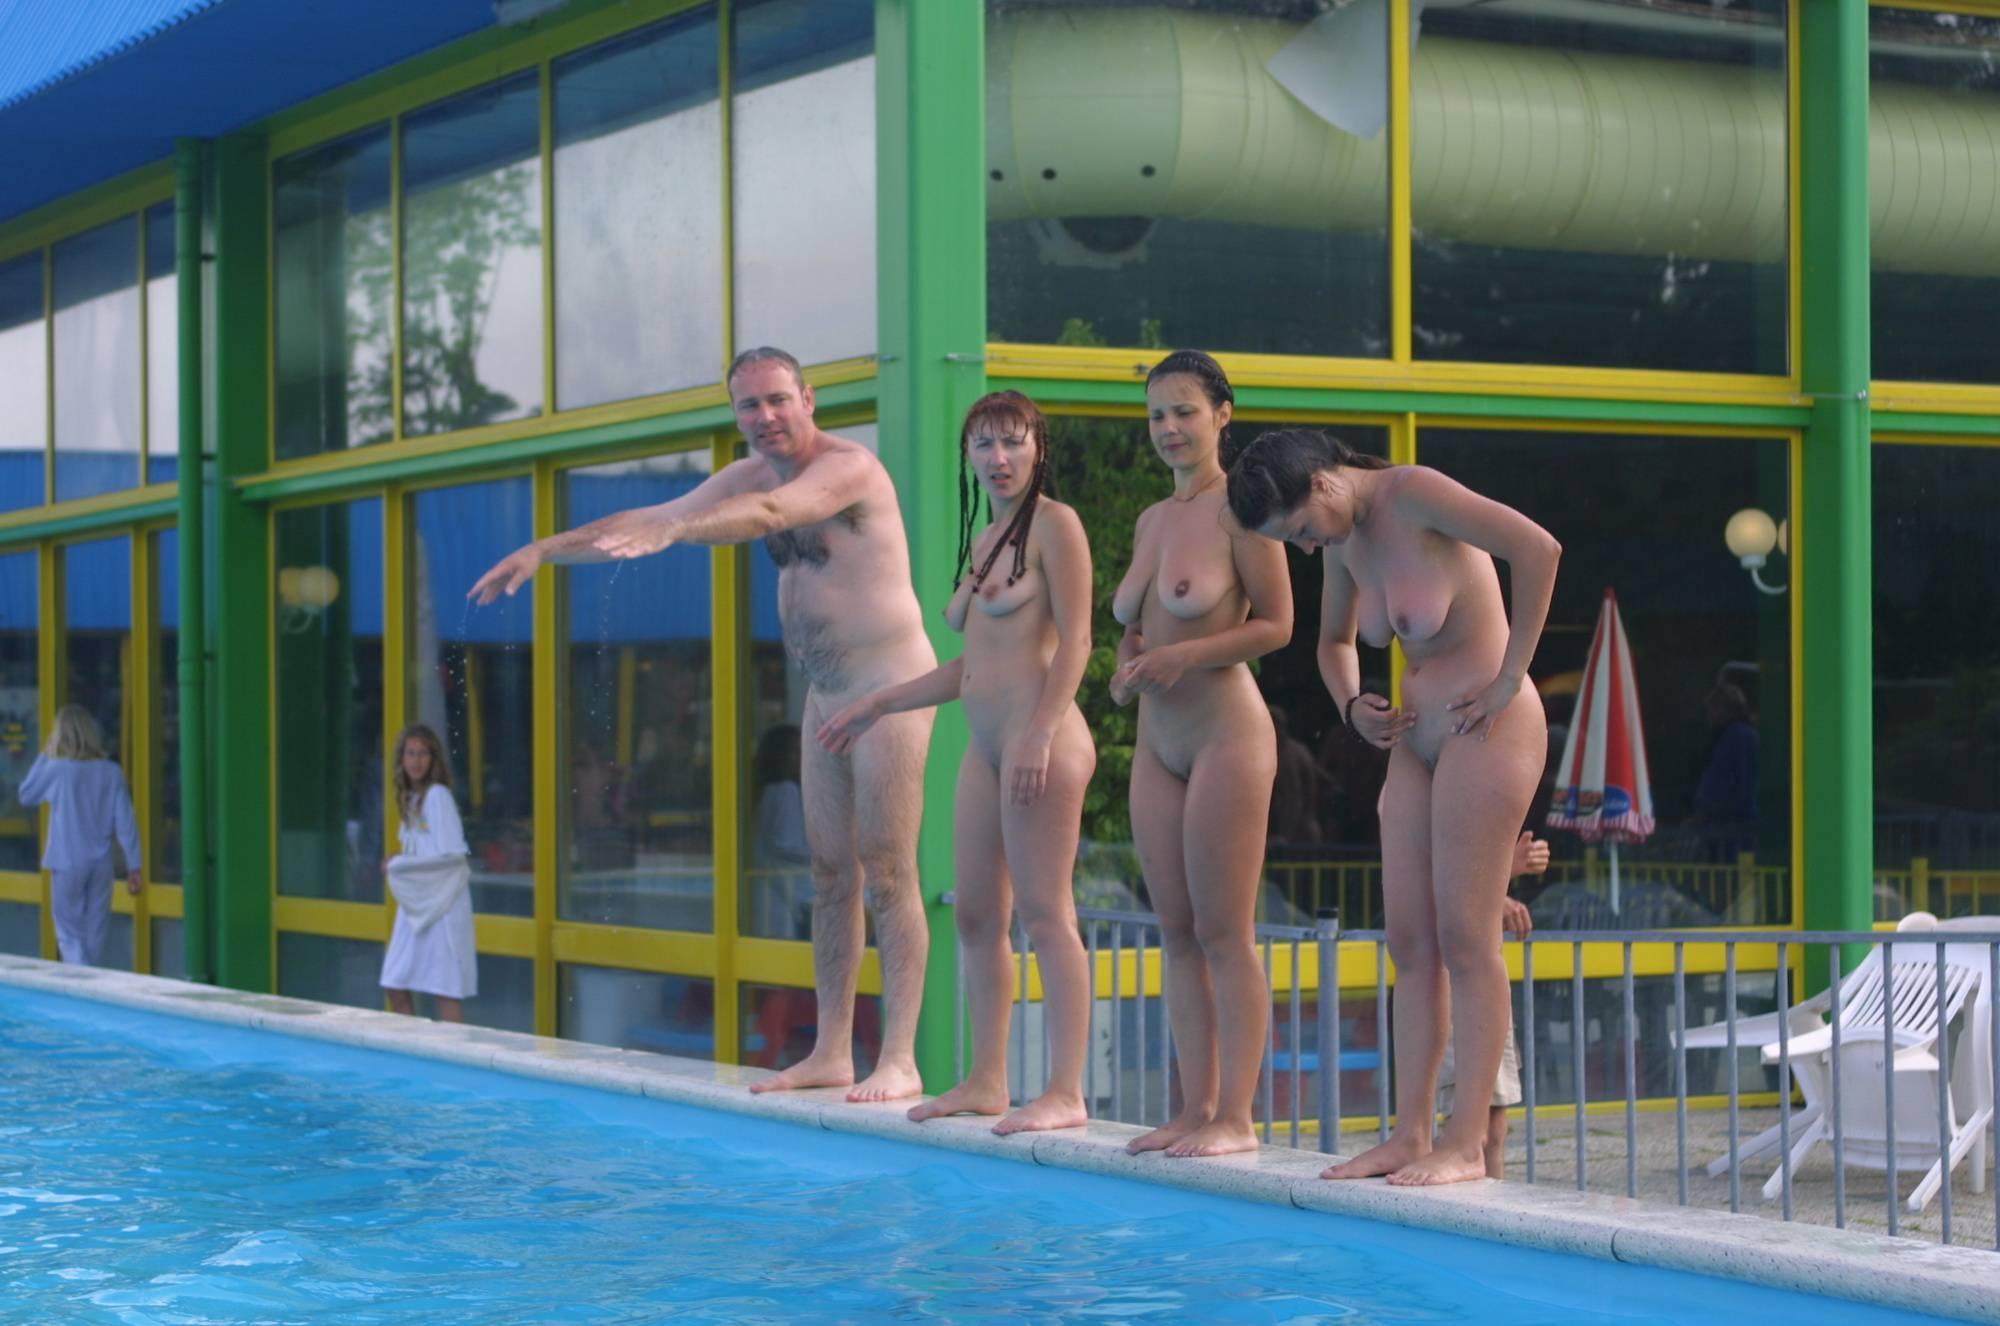 Holland Nudist Swim Club - 1